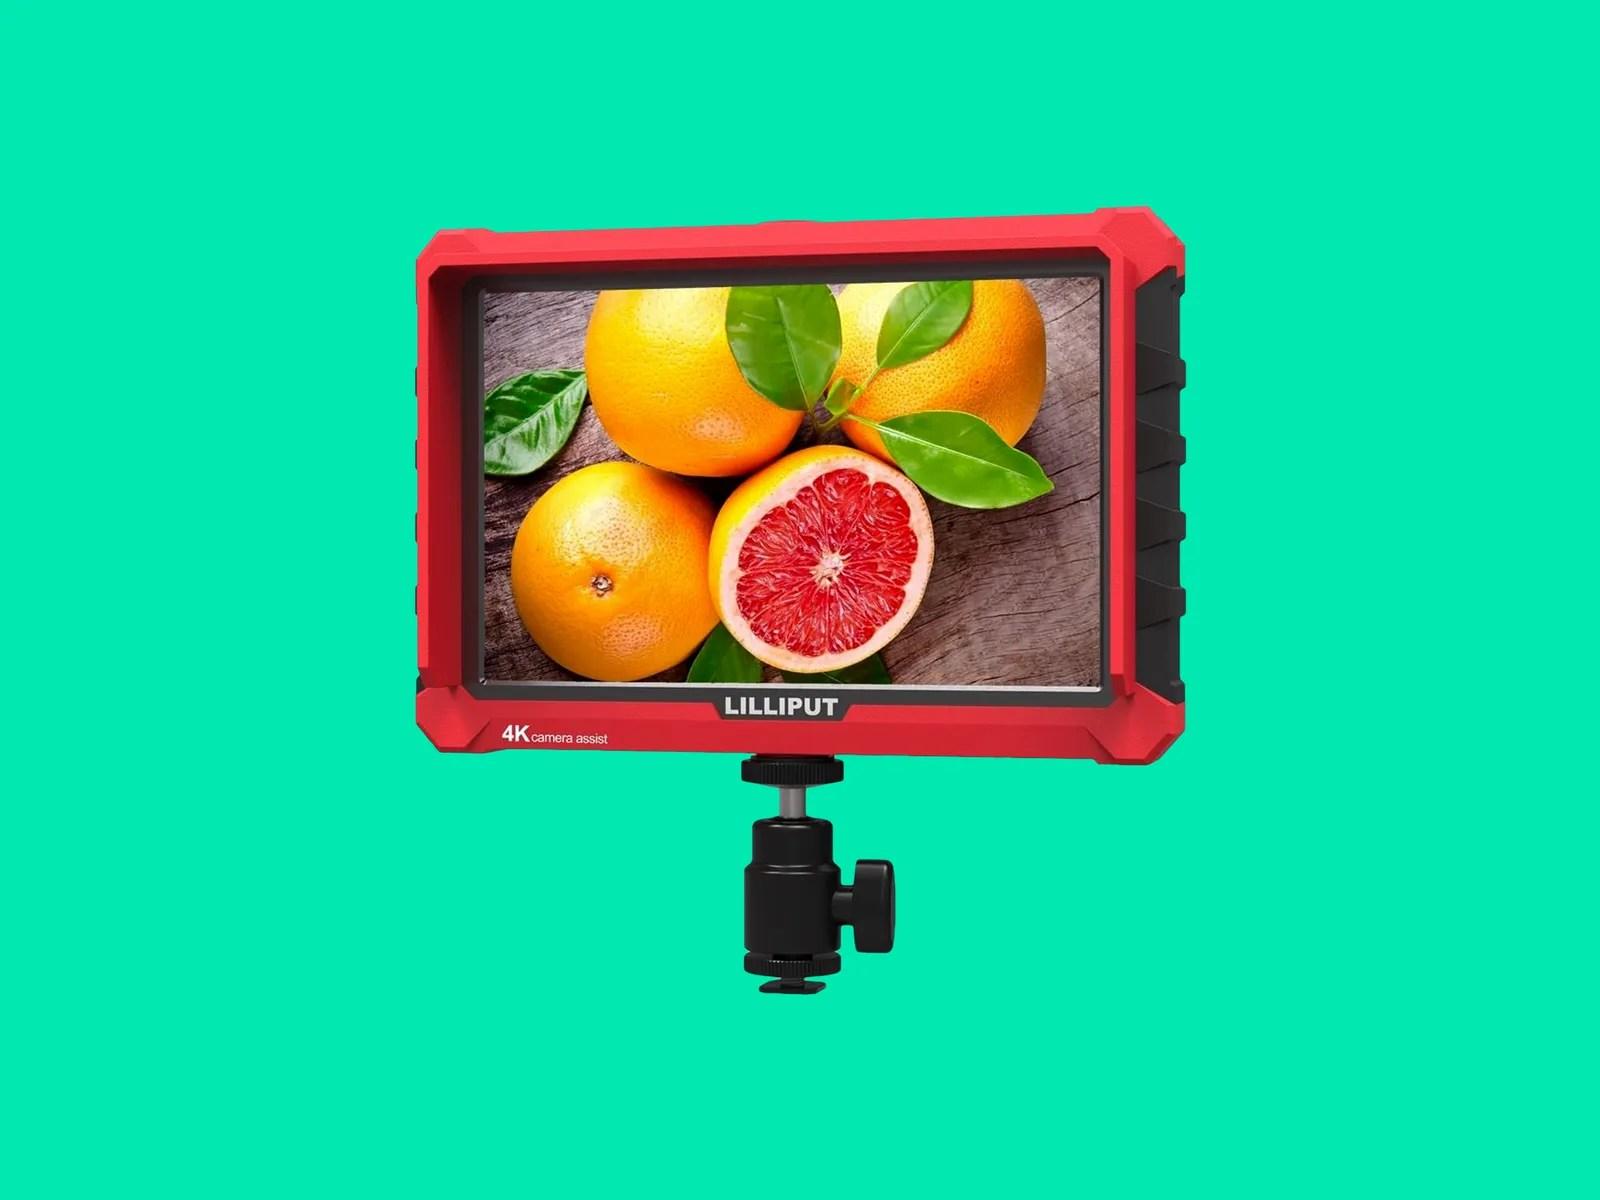 Lilliput A7S monitor